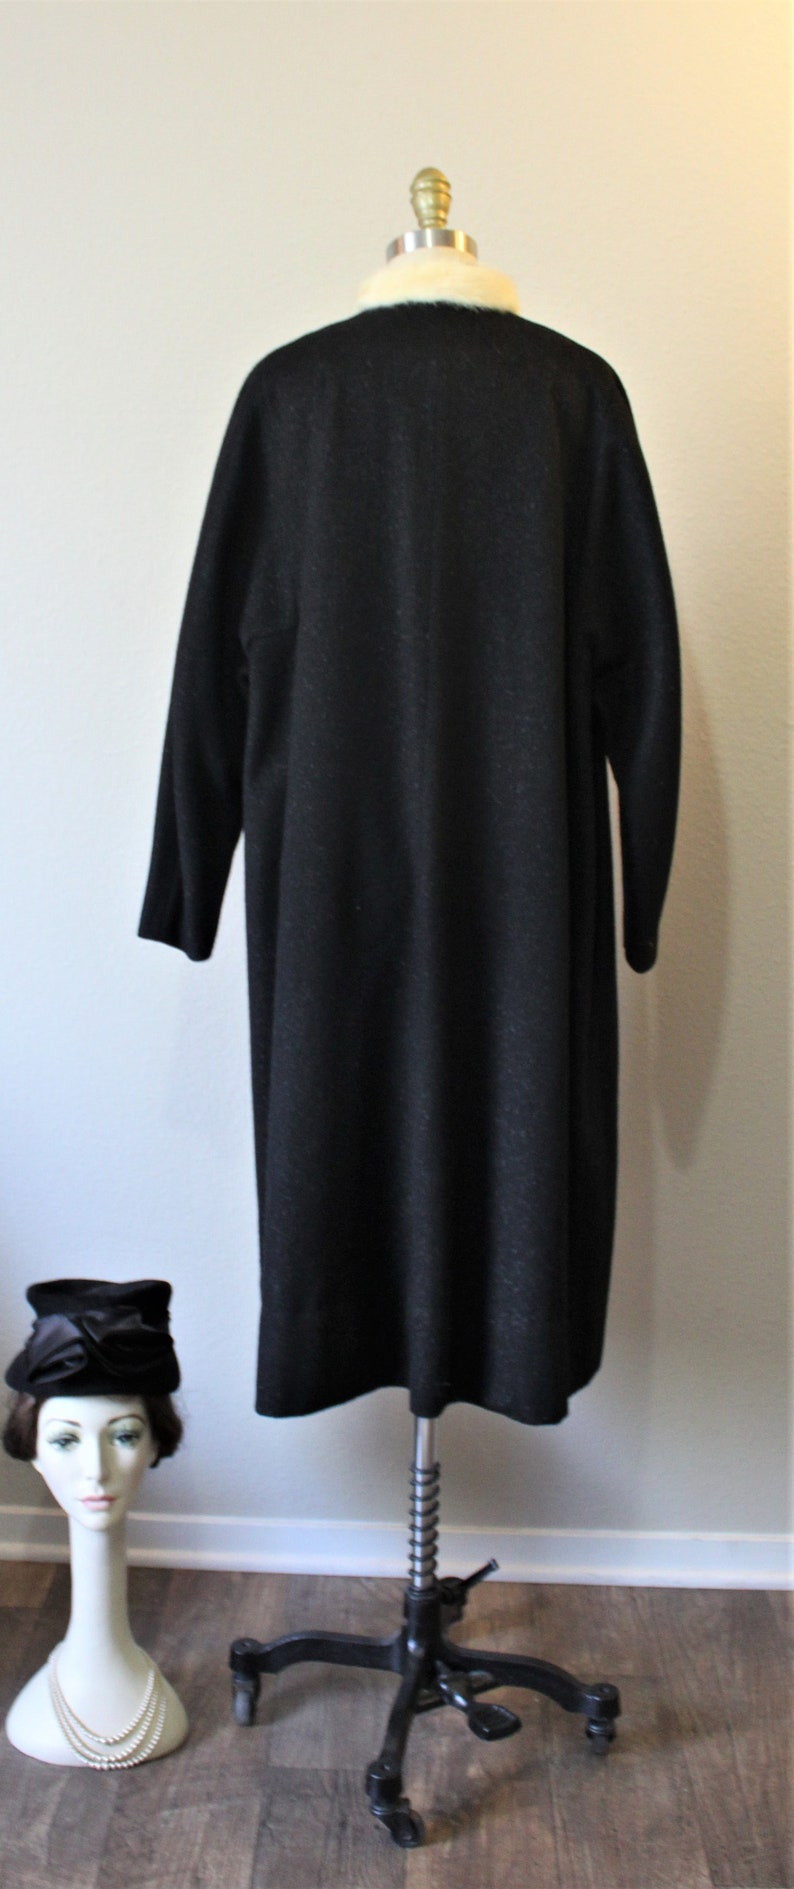 Vintage 40s 1950s Ranone Fancy Black Wool Coat Woven fibers Coat White Ermine Mink Collar Evening  US 4 6 8 s m